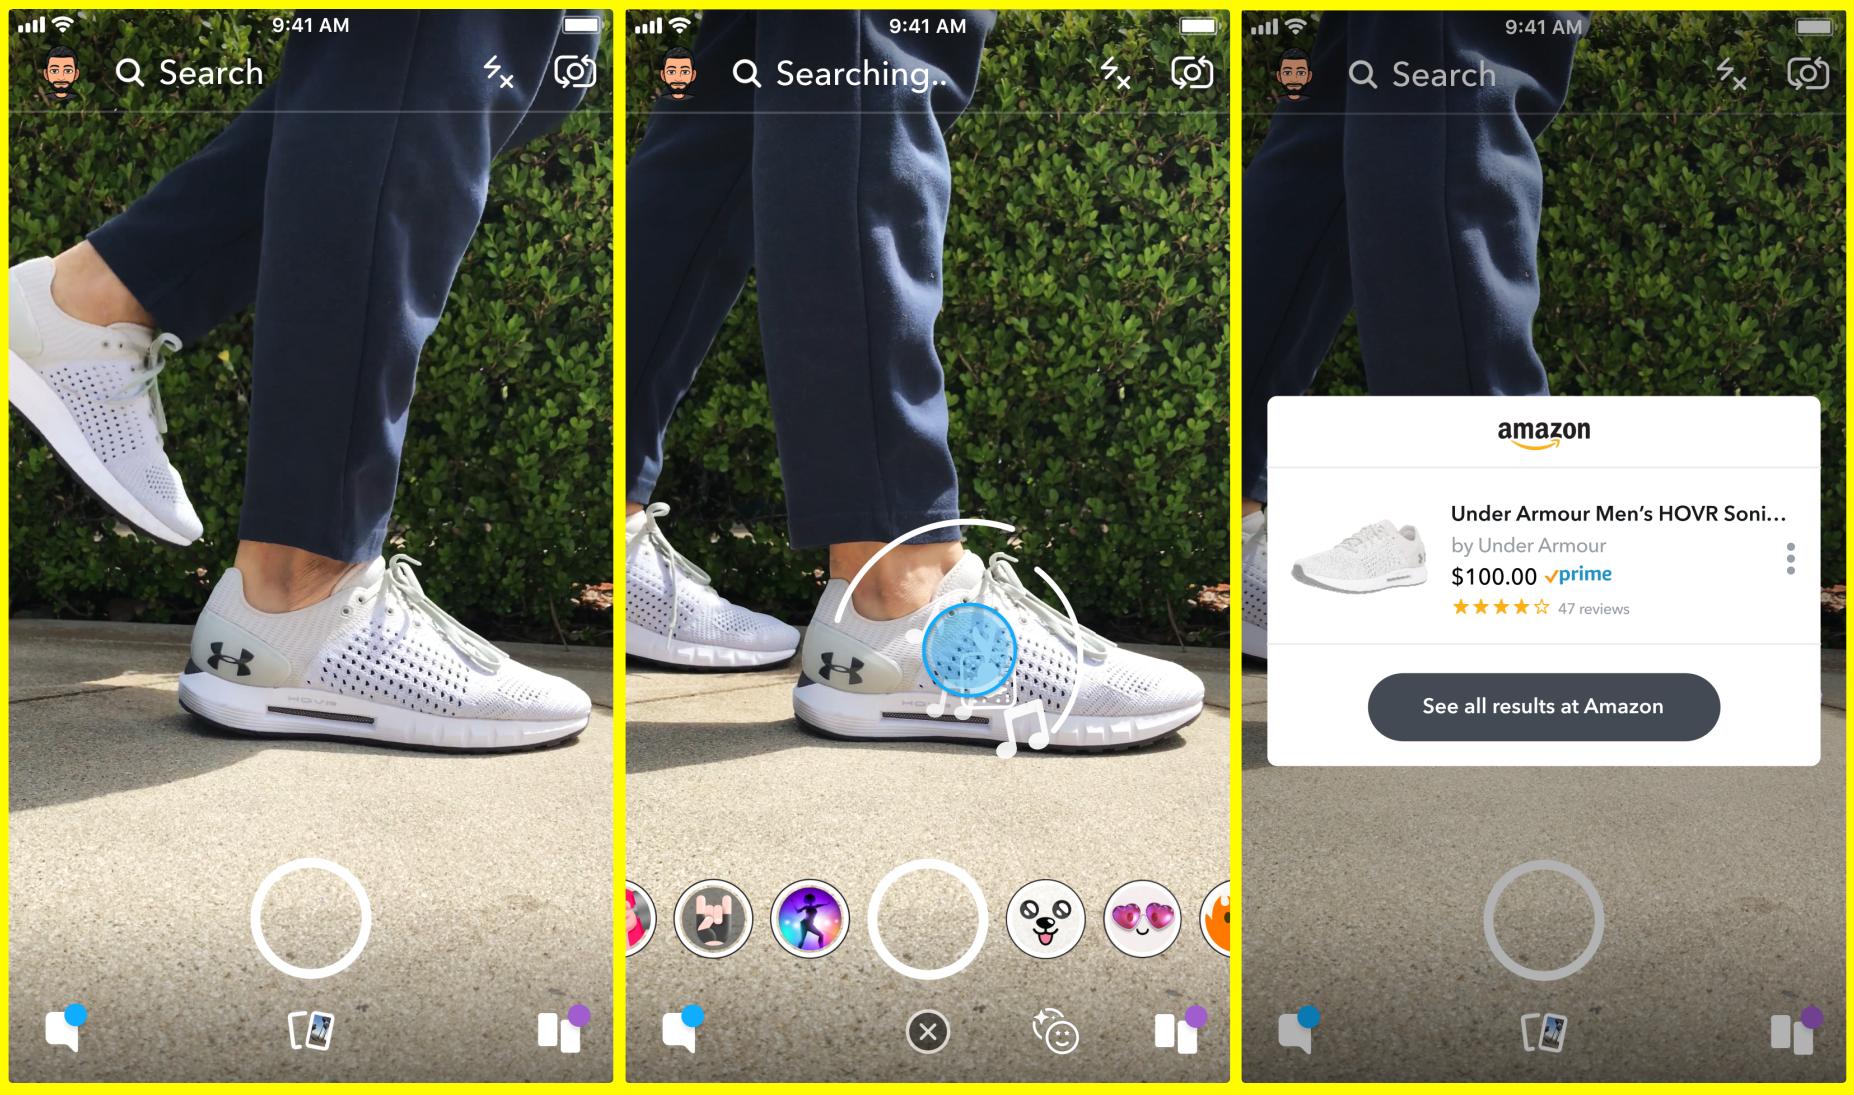 Snap's new visual e-commerce app